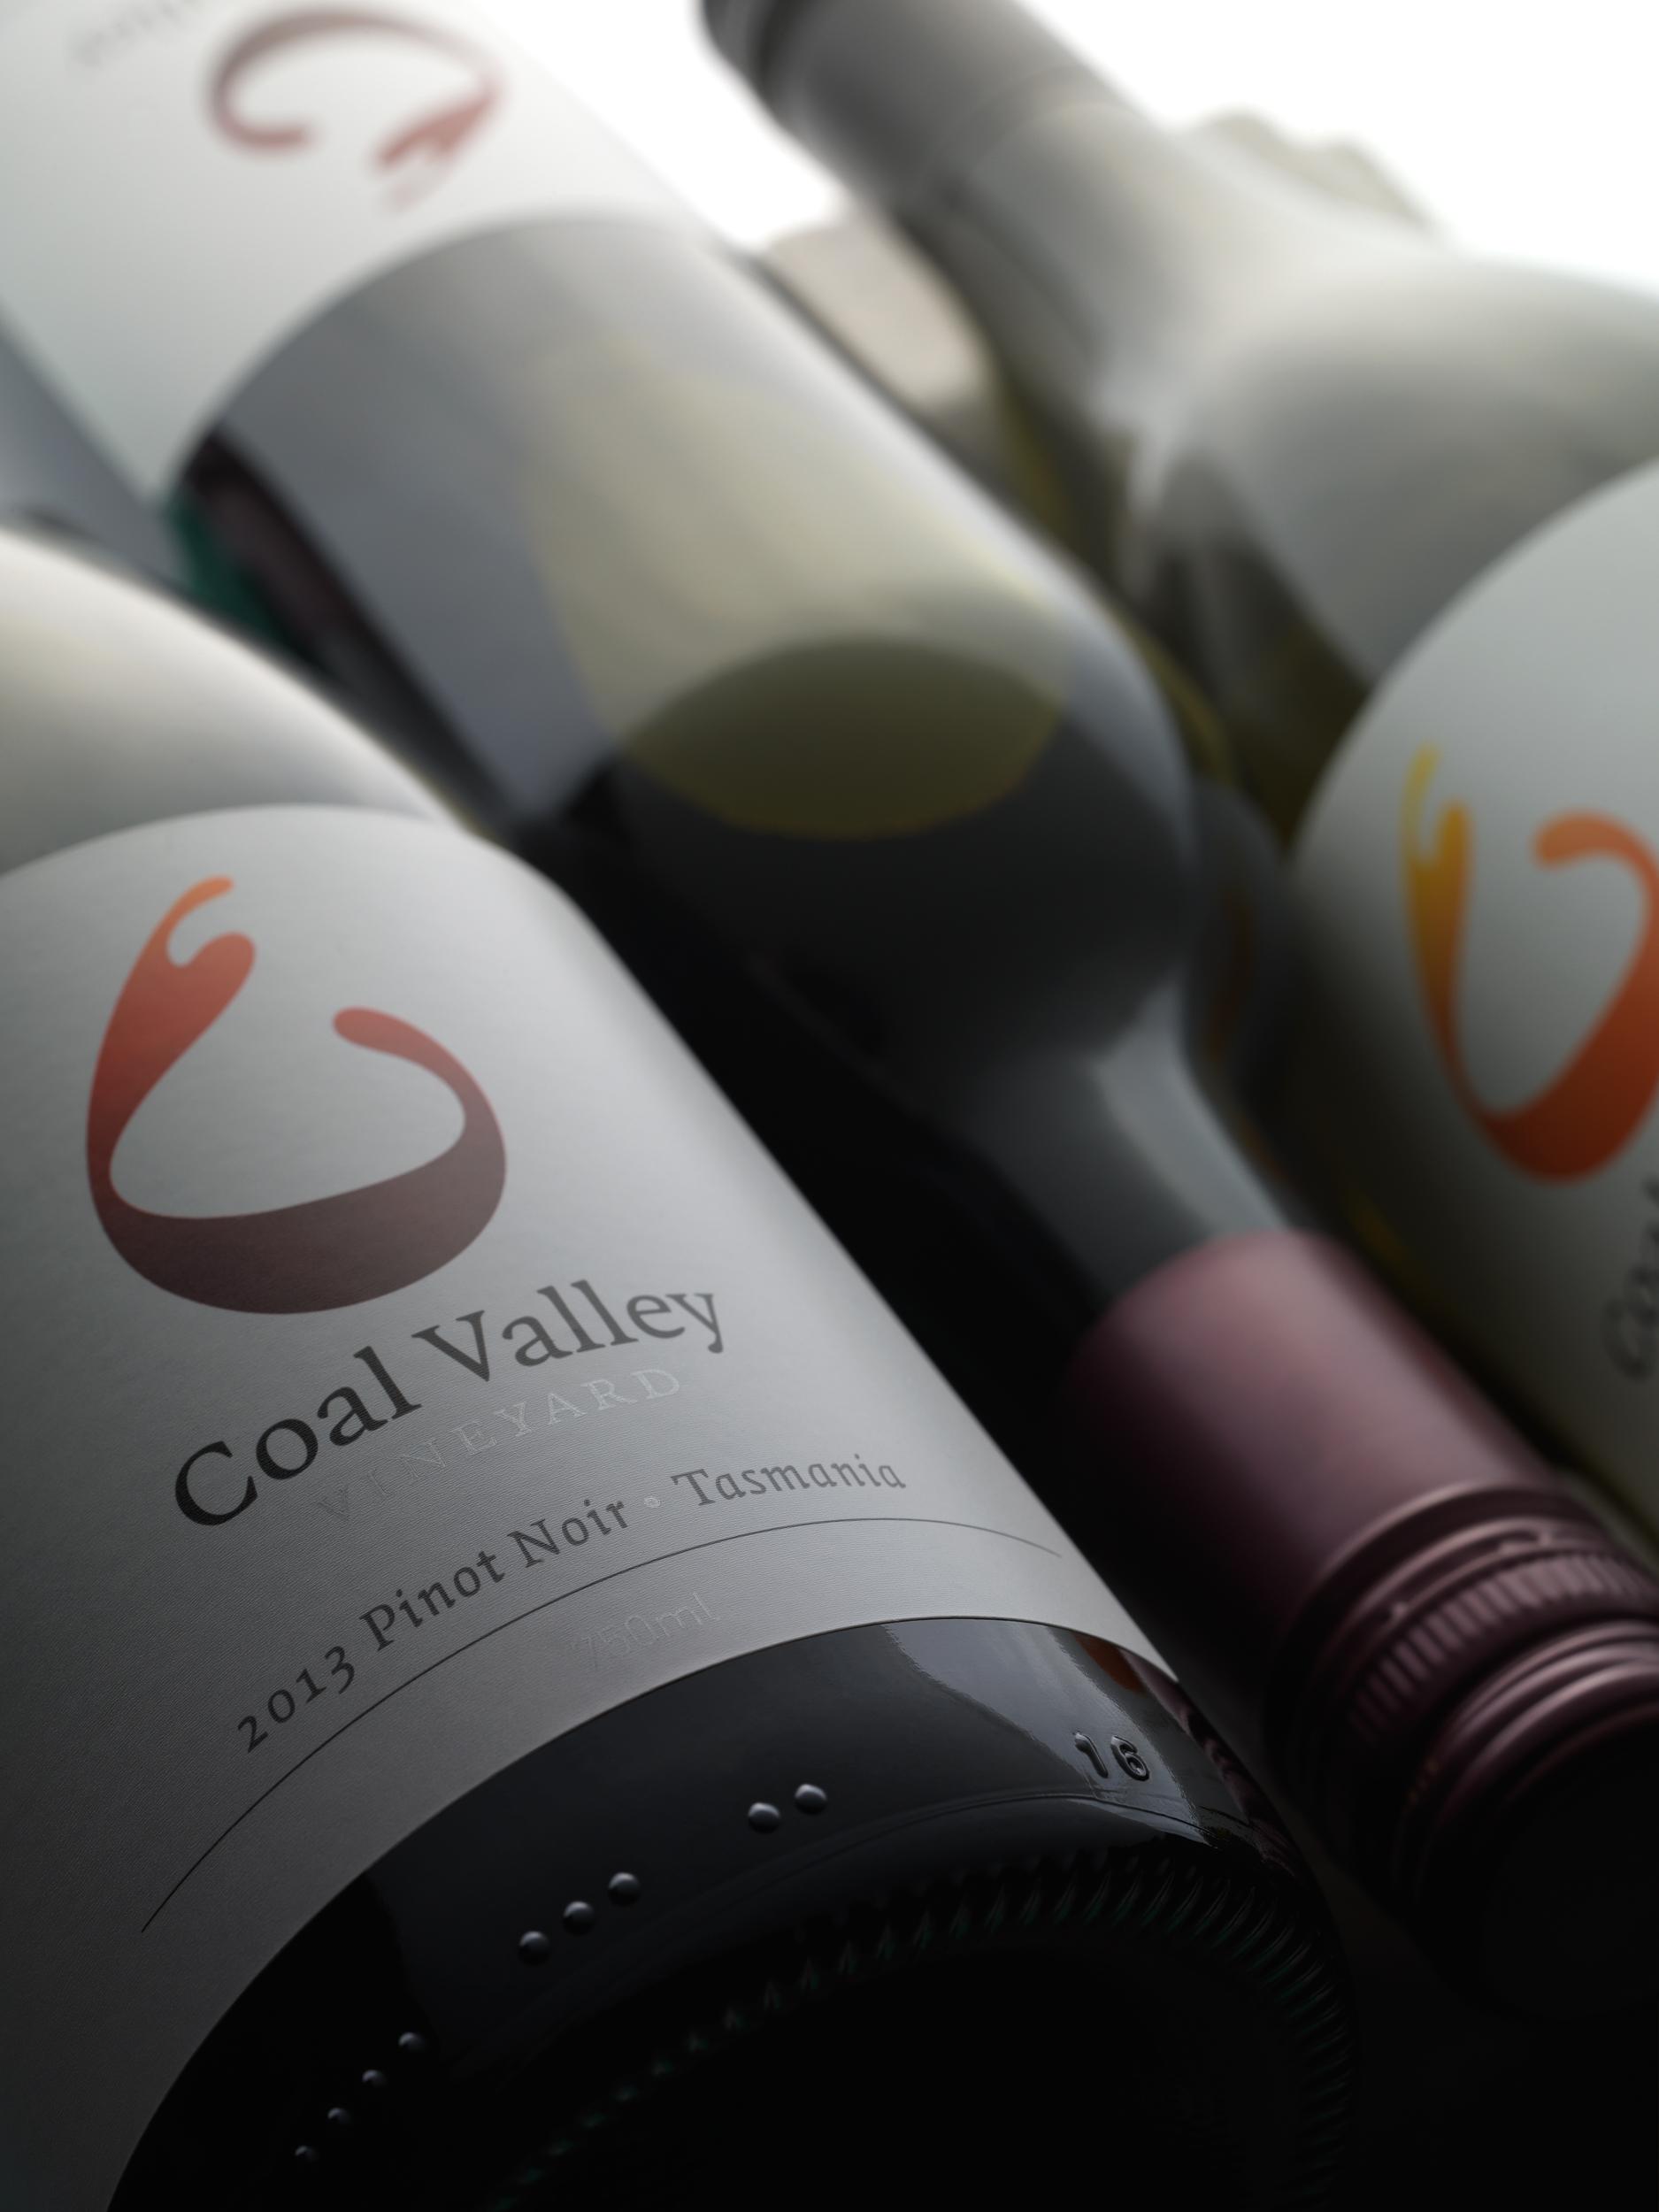 Branding image for Coal Valley Vineyard